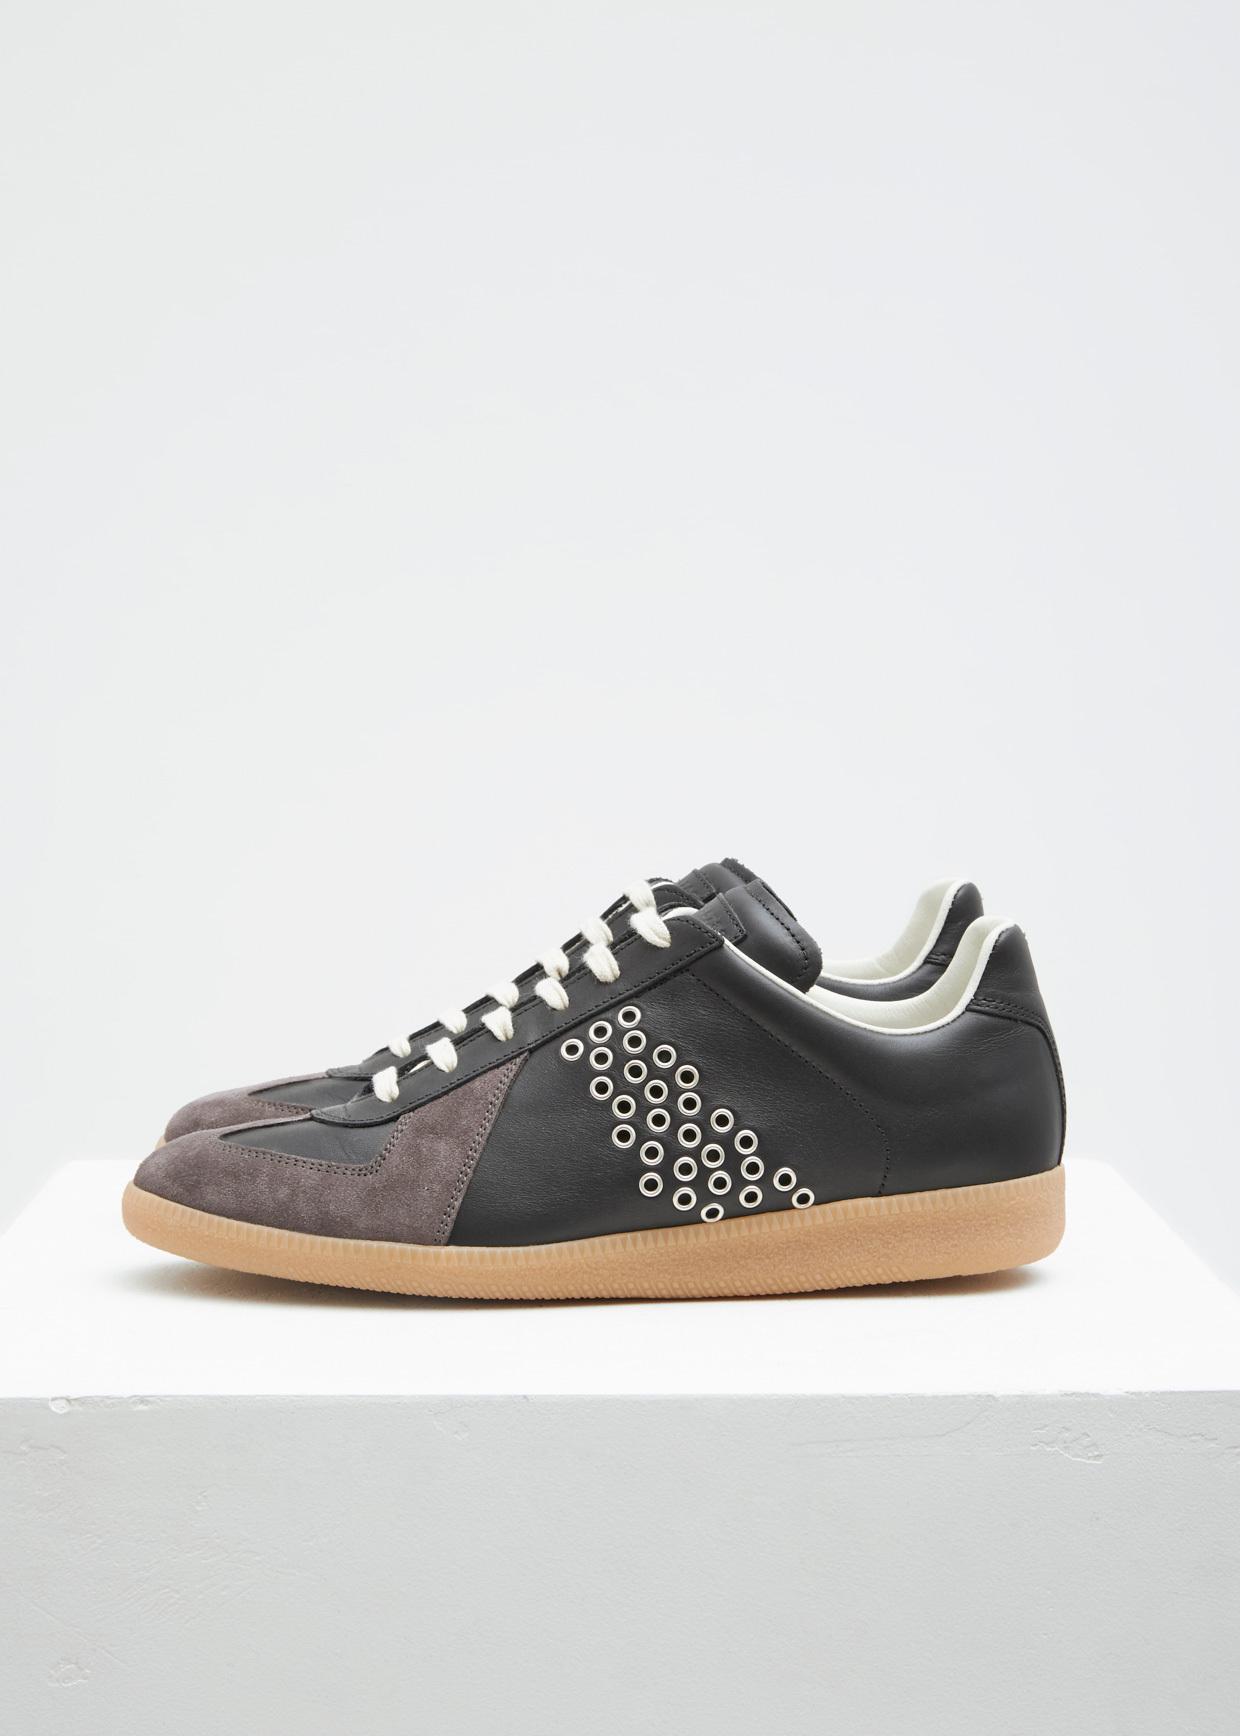 Replica Tod Shoes Uk